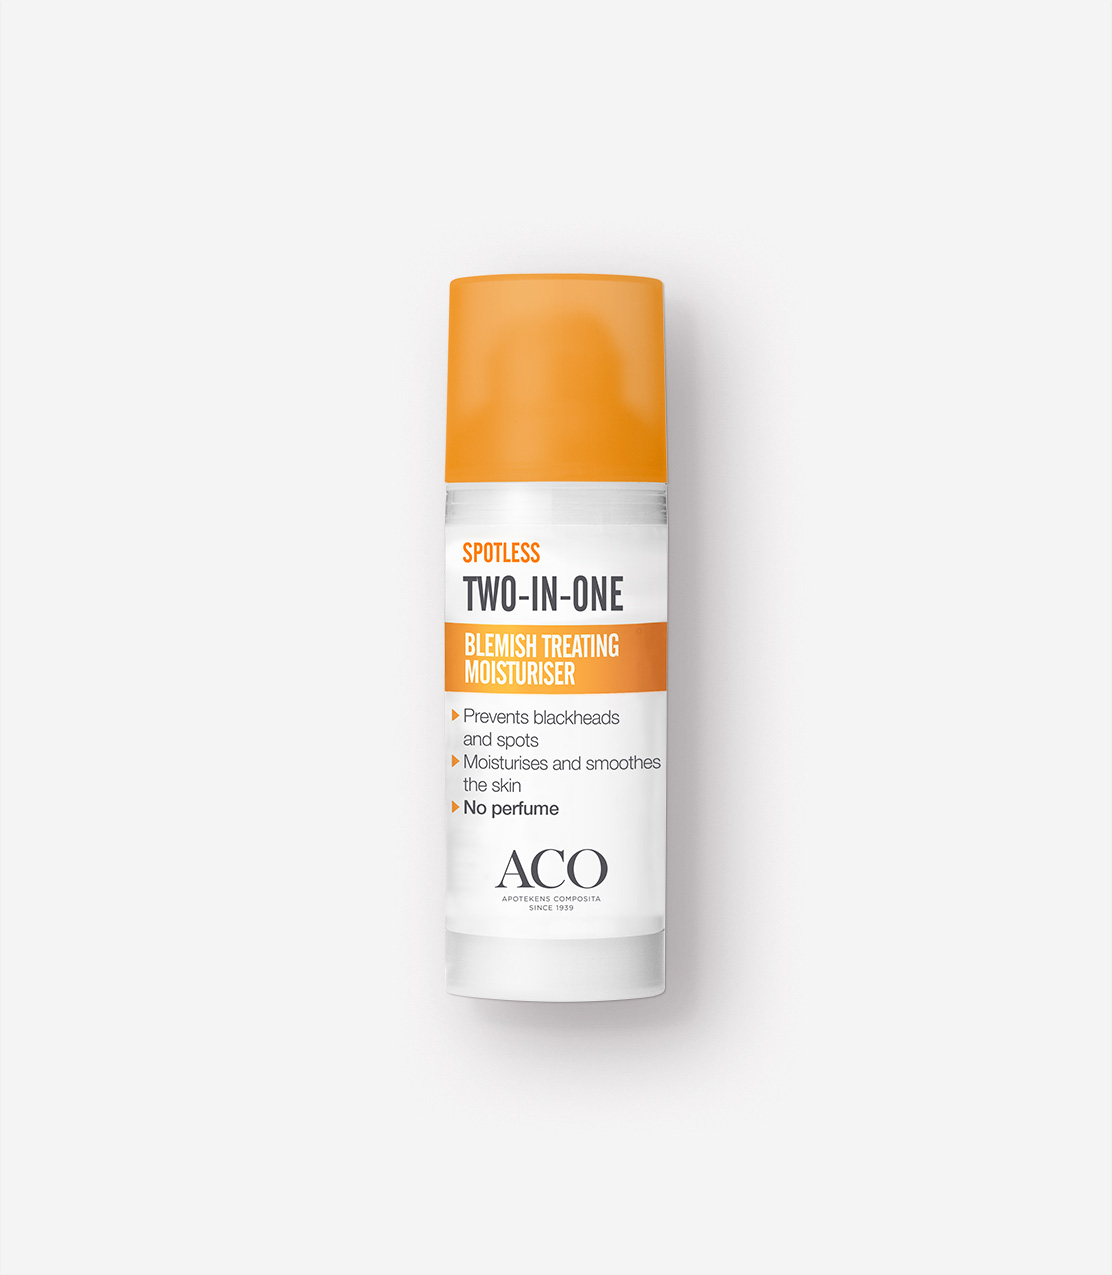 aco spotless acne treatment